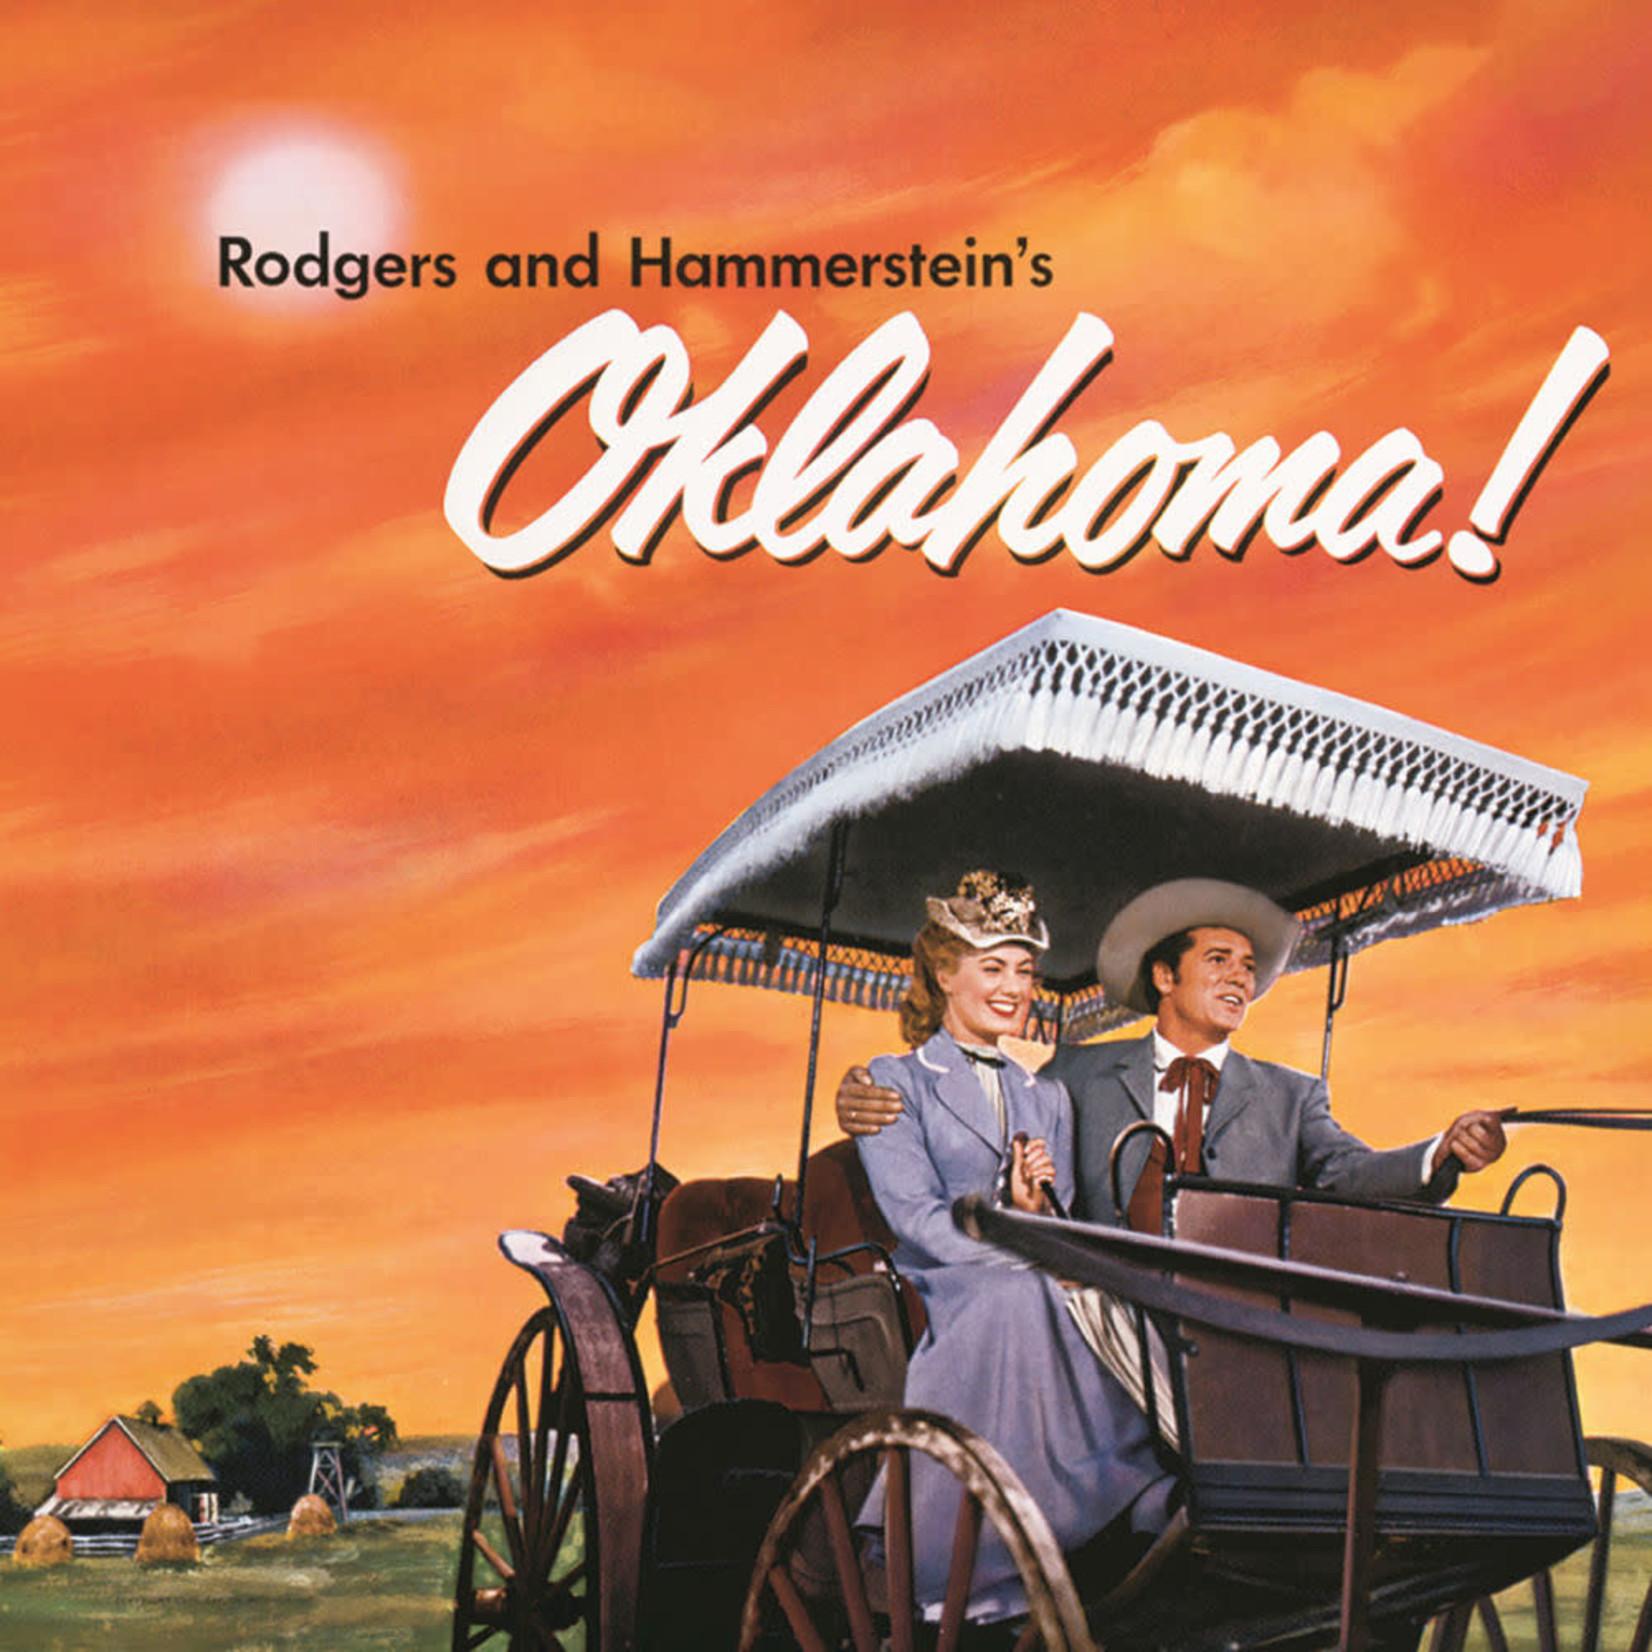 [Vintage] Rodgers & Hammerstein: Oklahoma! (Soundtrack)